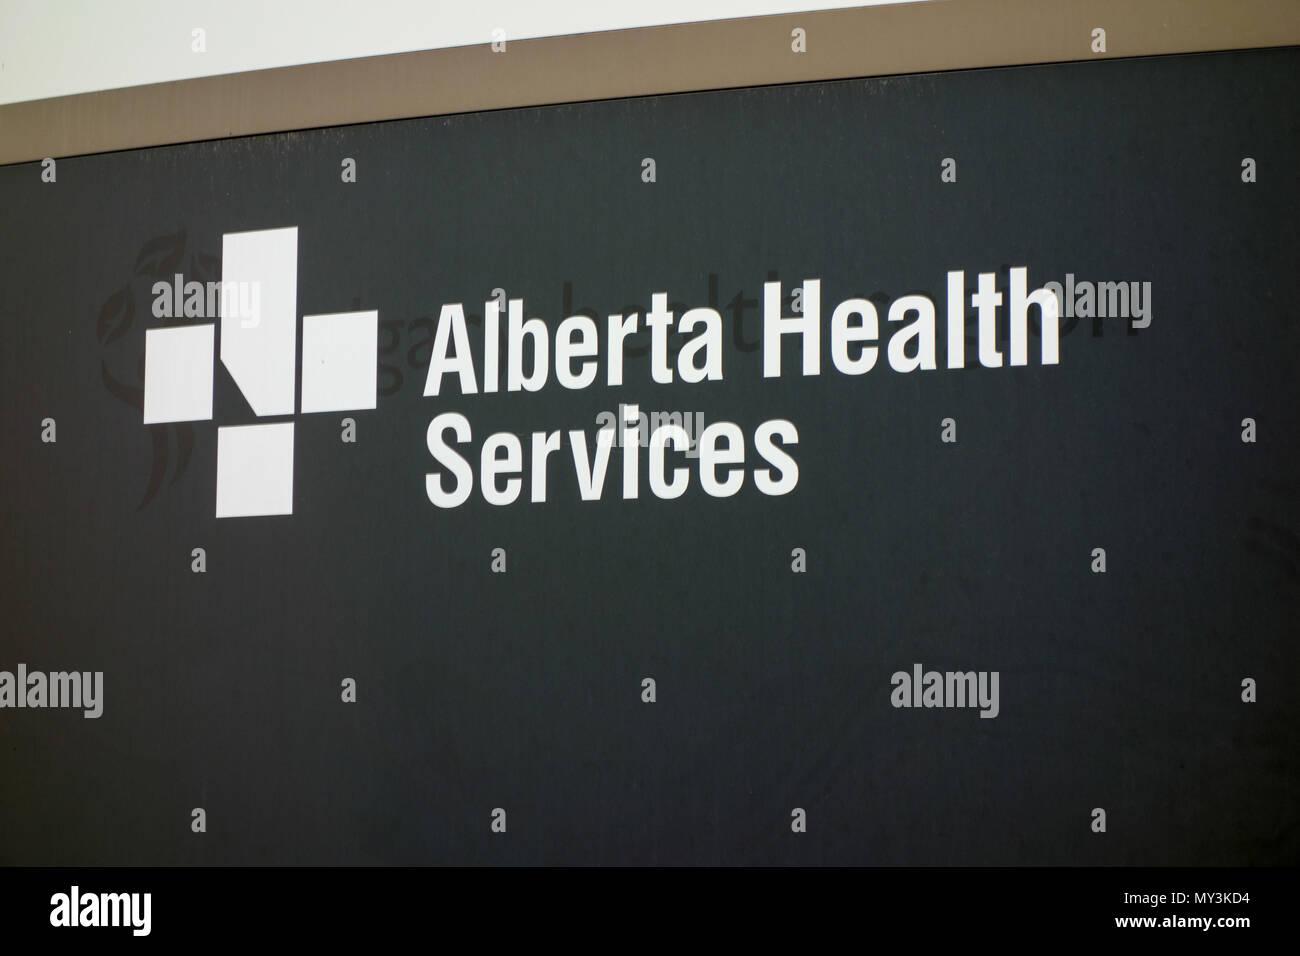 Alberta Health Services Sign; Entrance to the Sheldon M. Chumir Health Centre, Calgary, Alberta, Canada. - Stock Image